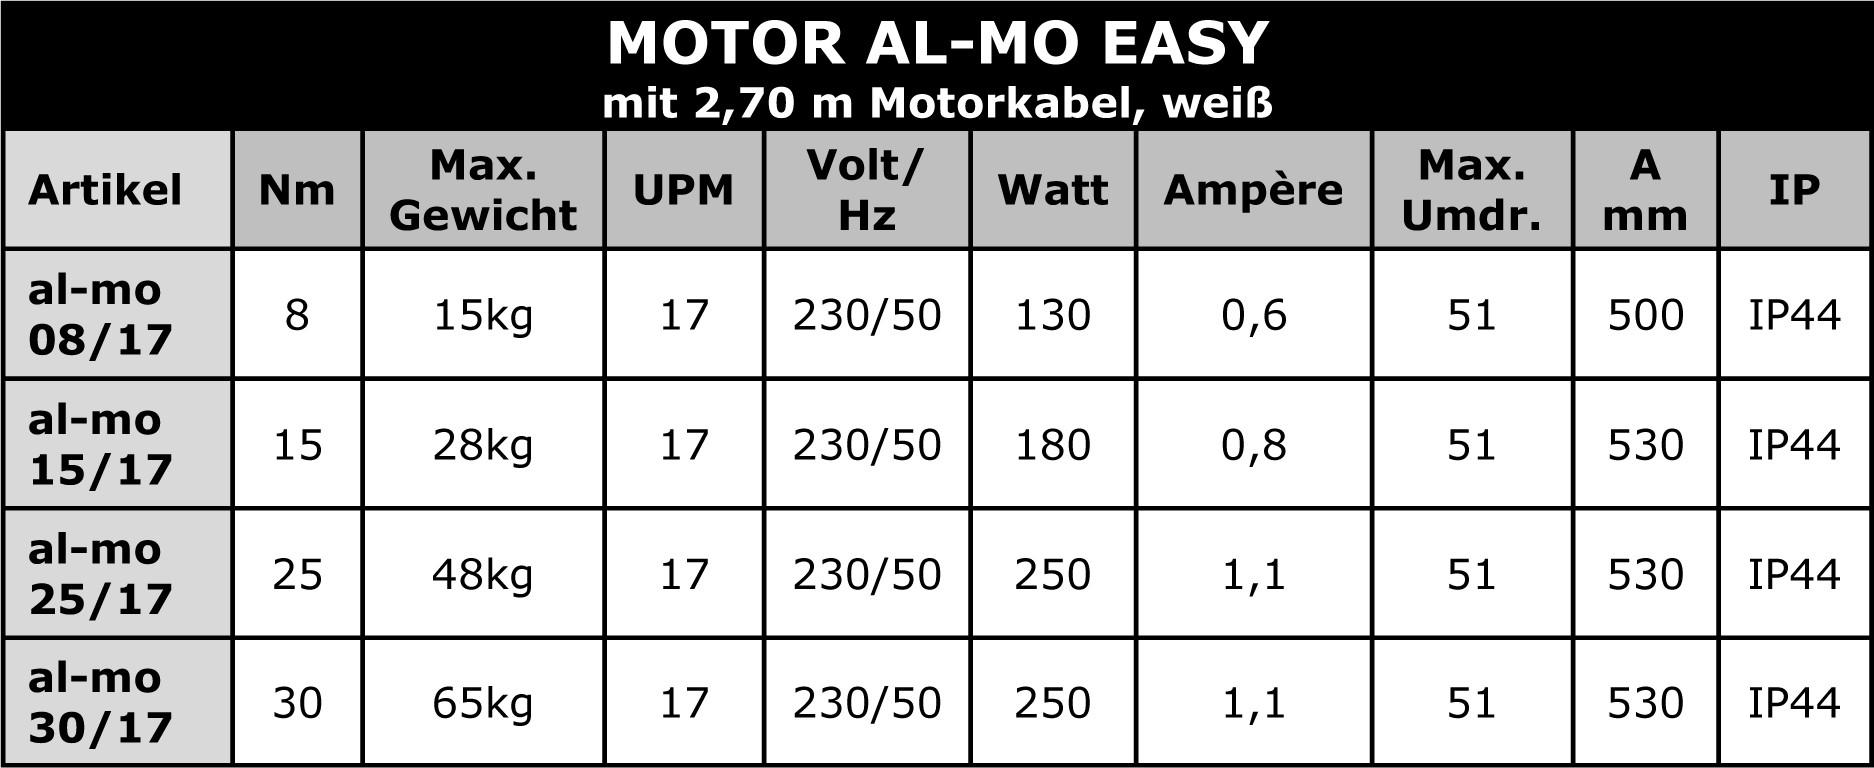 Altron al-mo easy Technische Daten